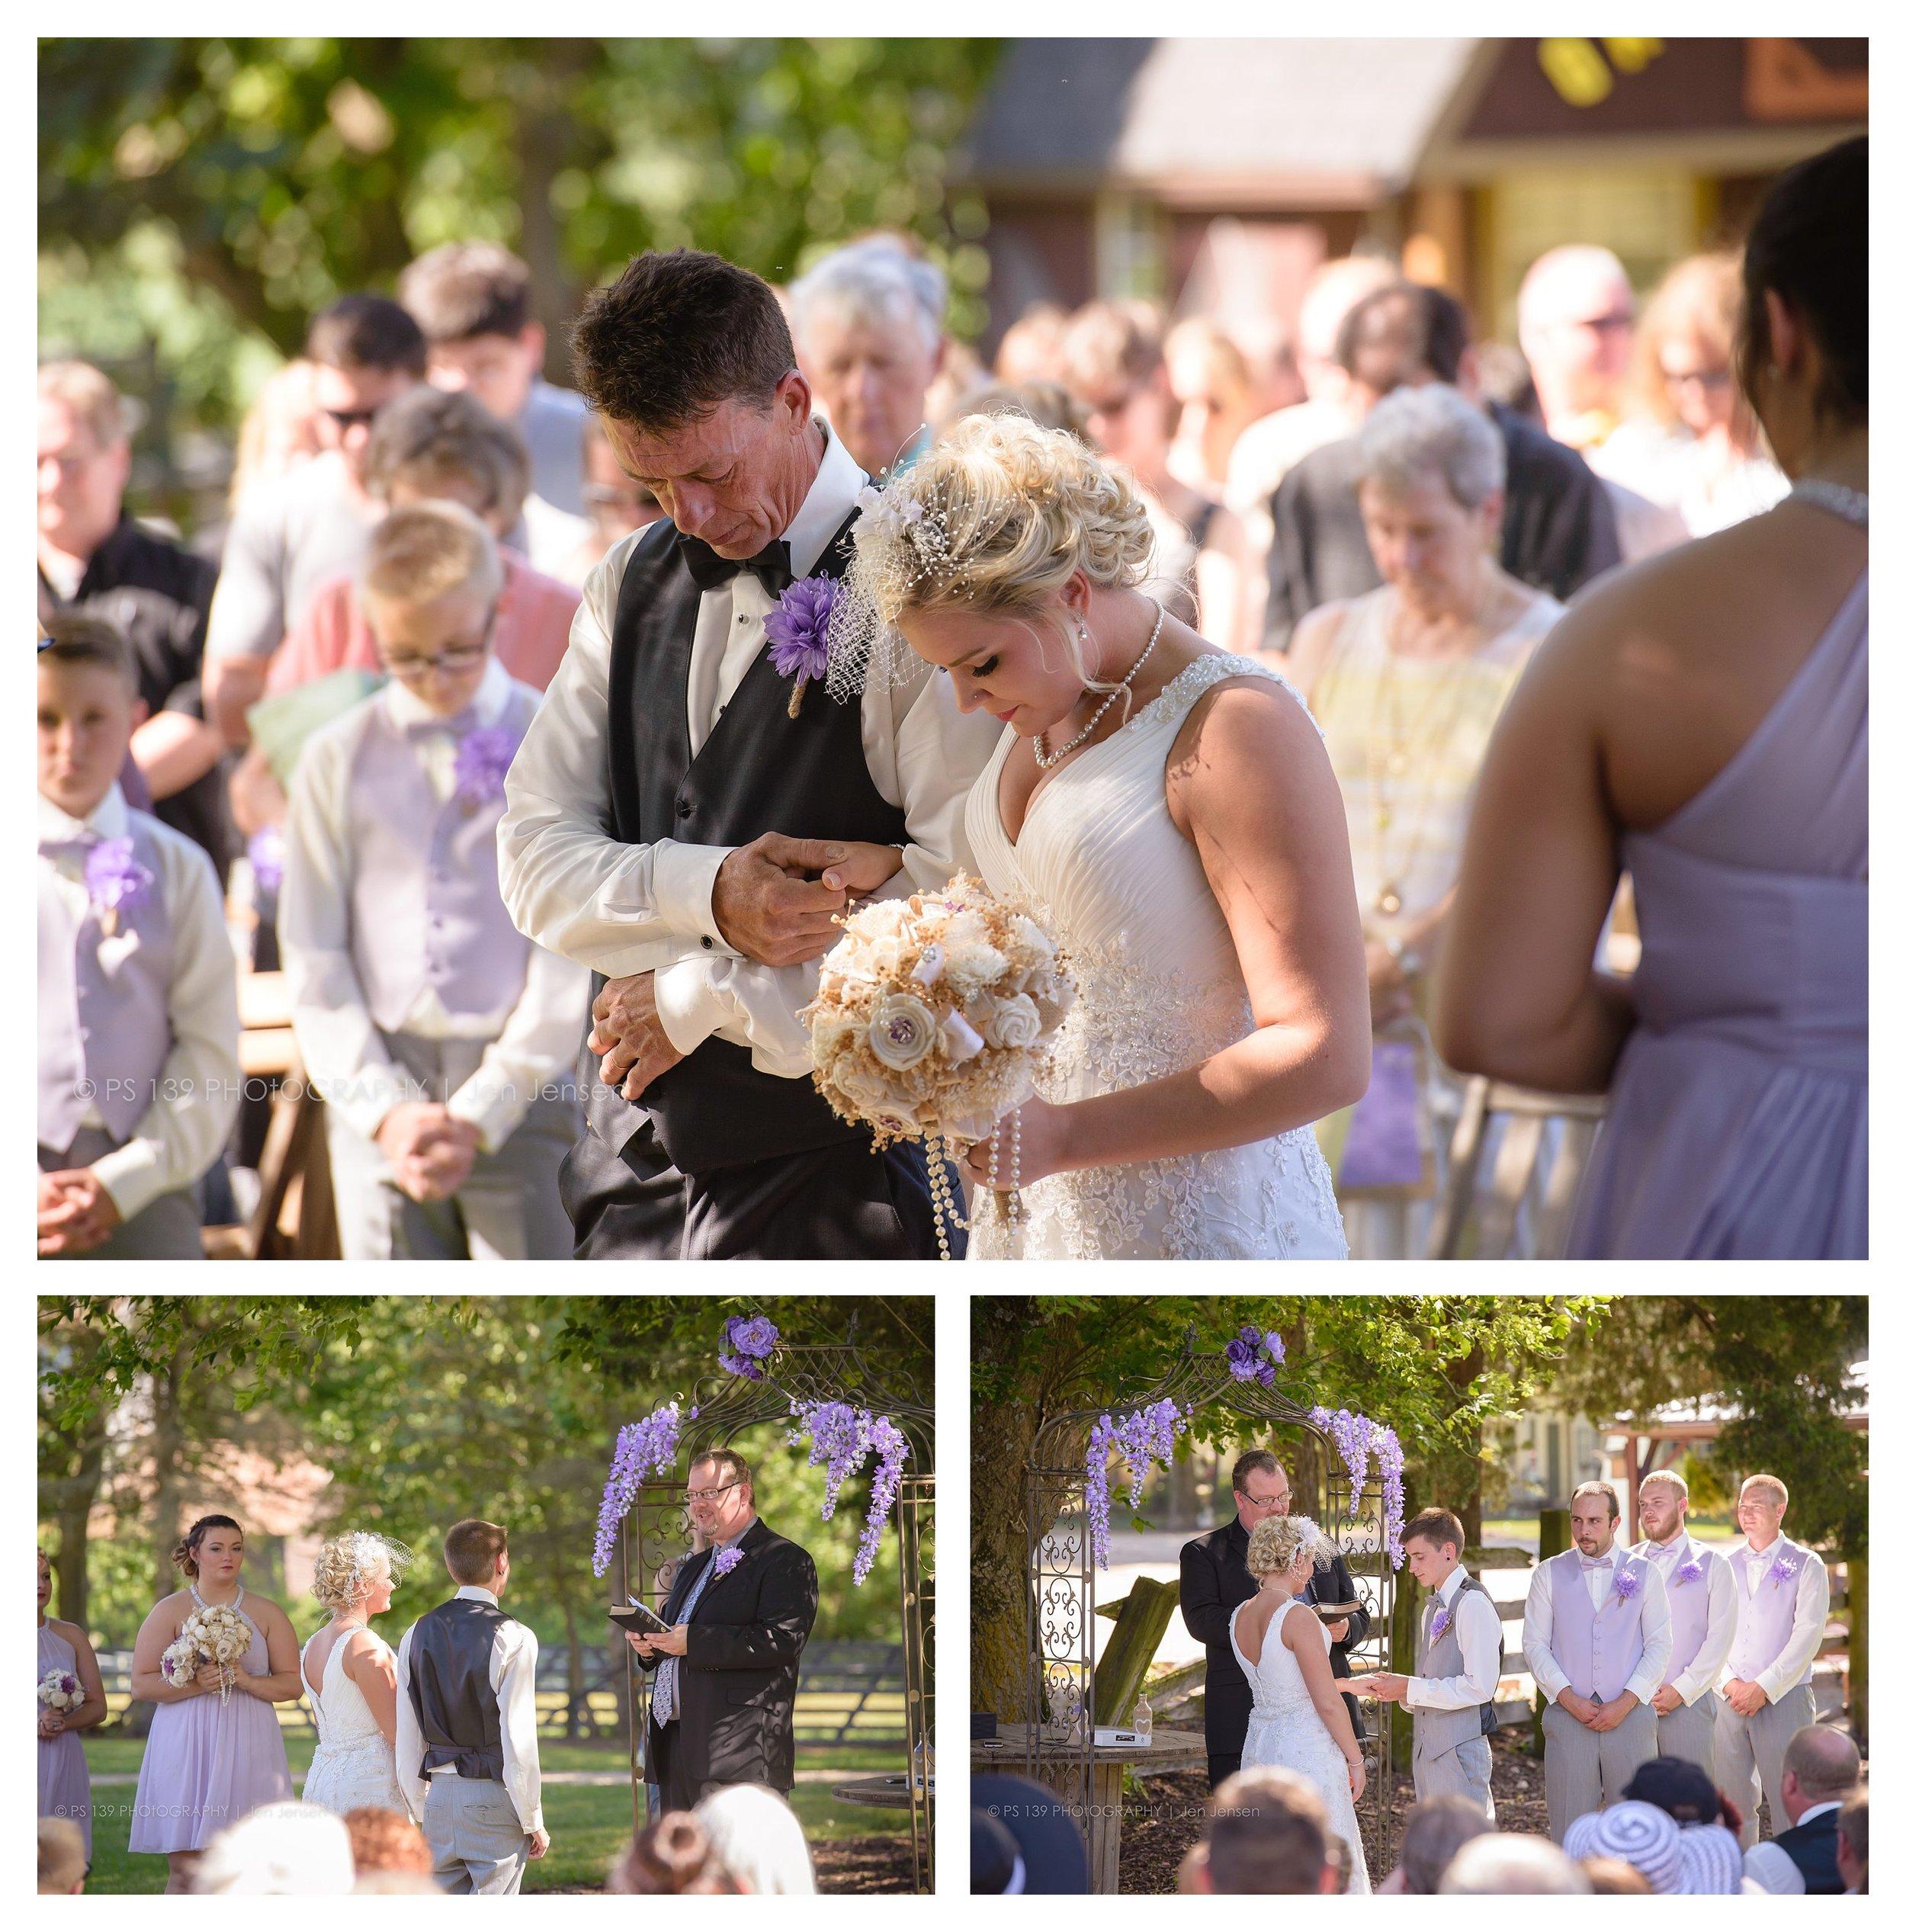 oregon Illinois oak lane farm wisconsin wedding photographer bayfield wi ps 139 photography jen jensen_0259.jpg